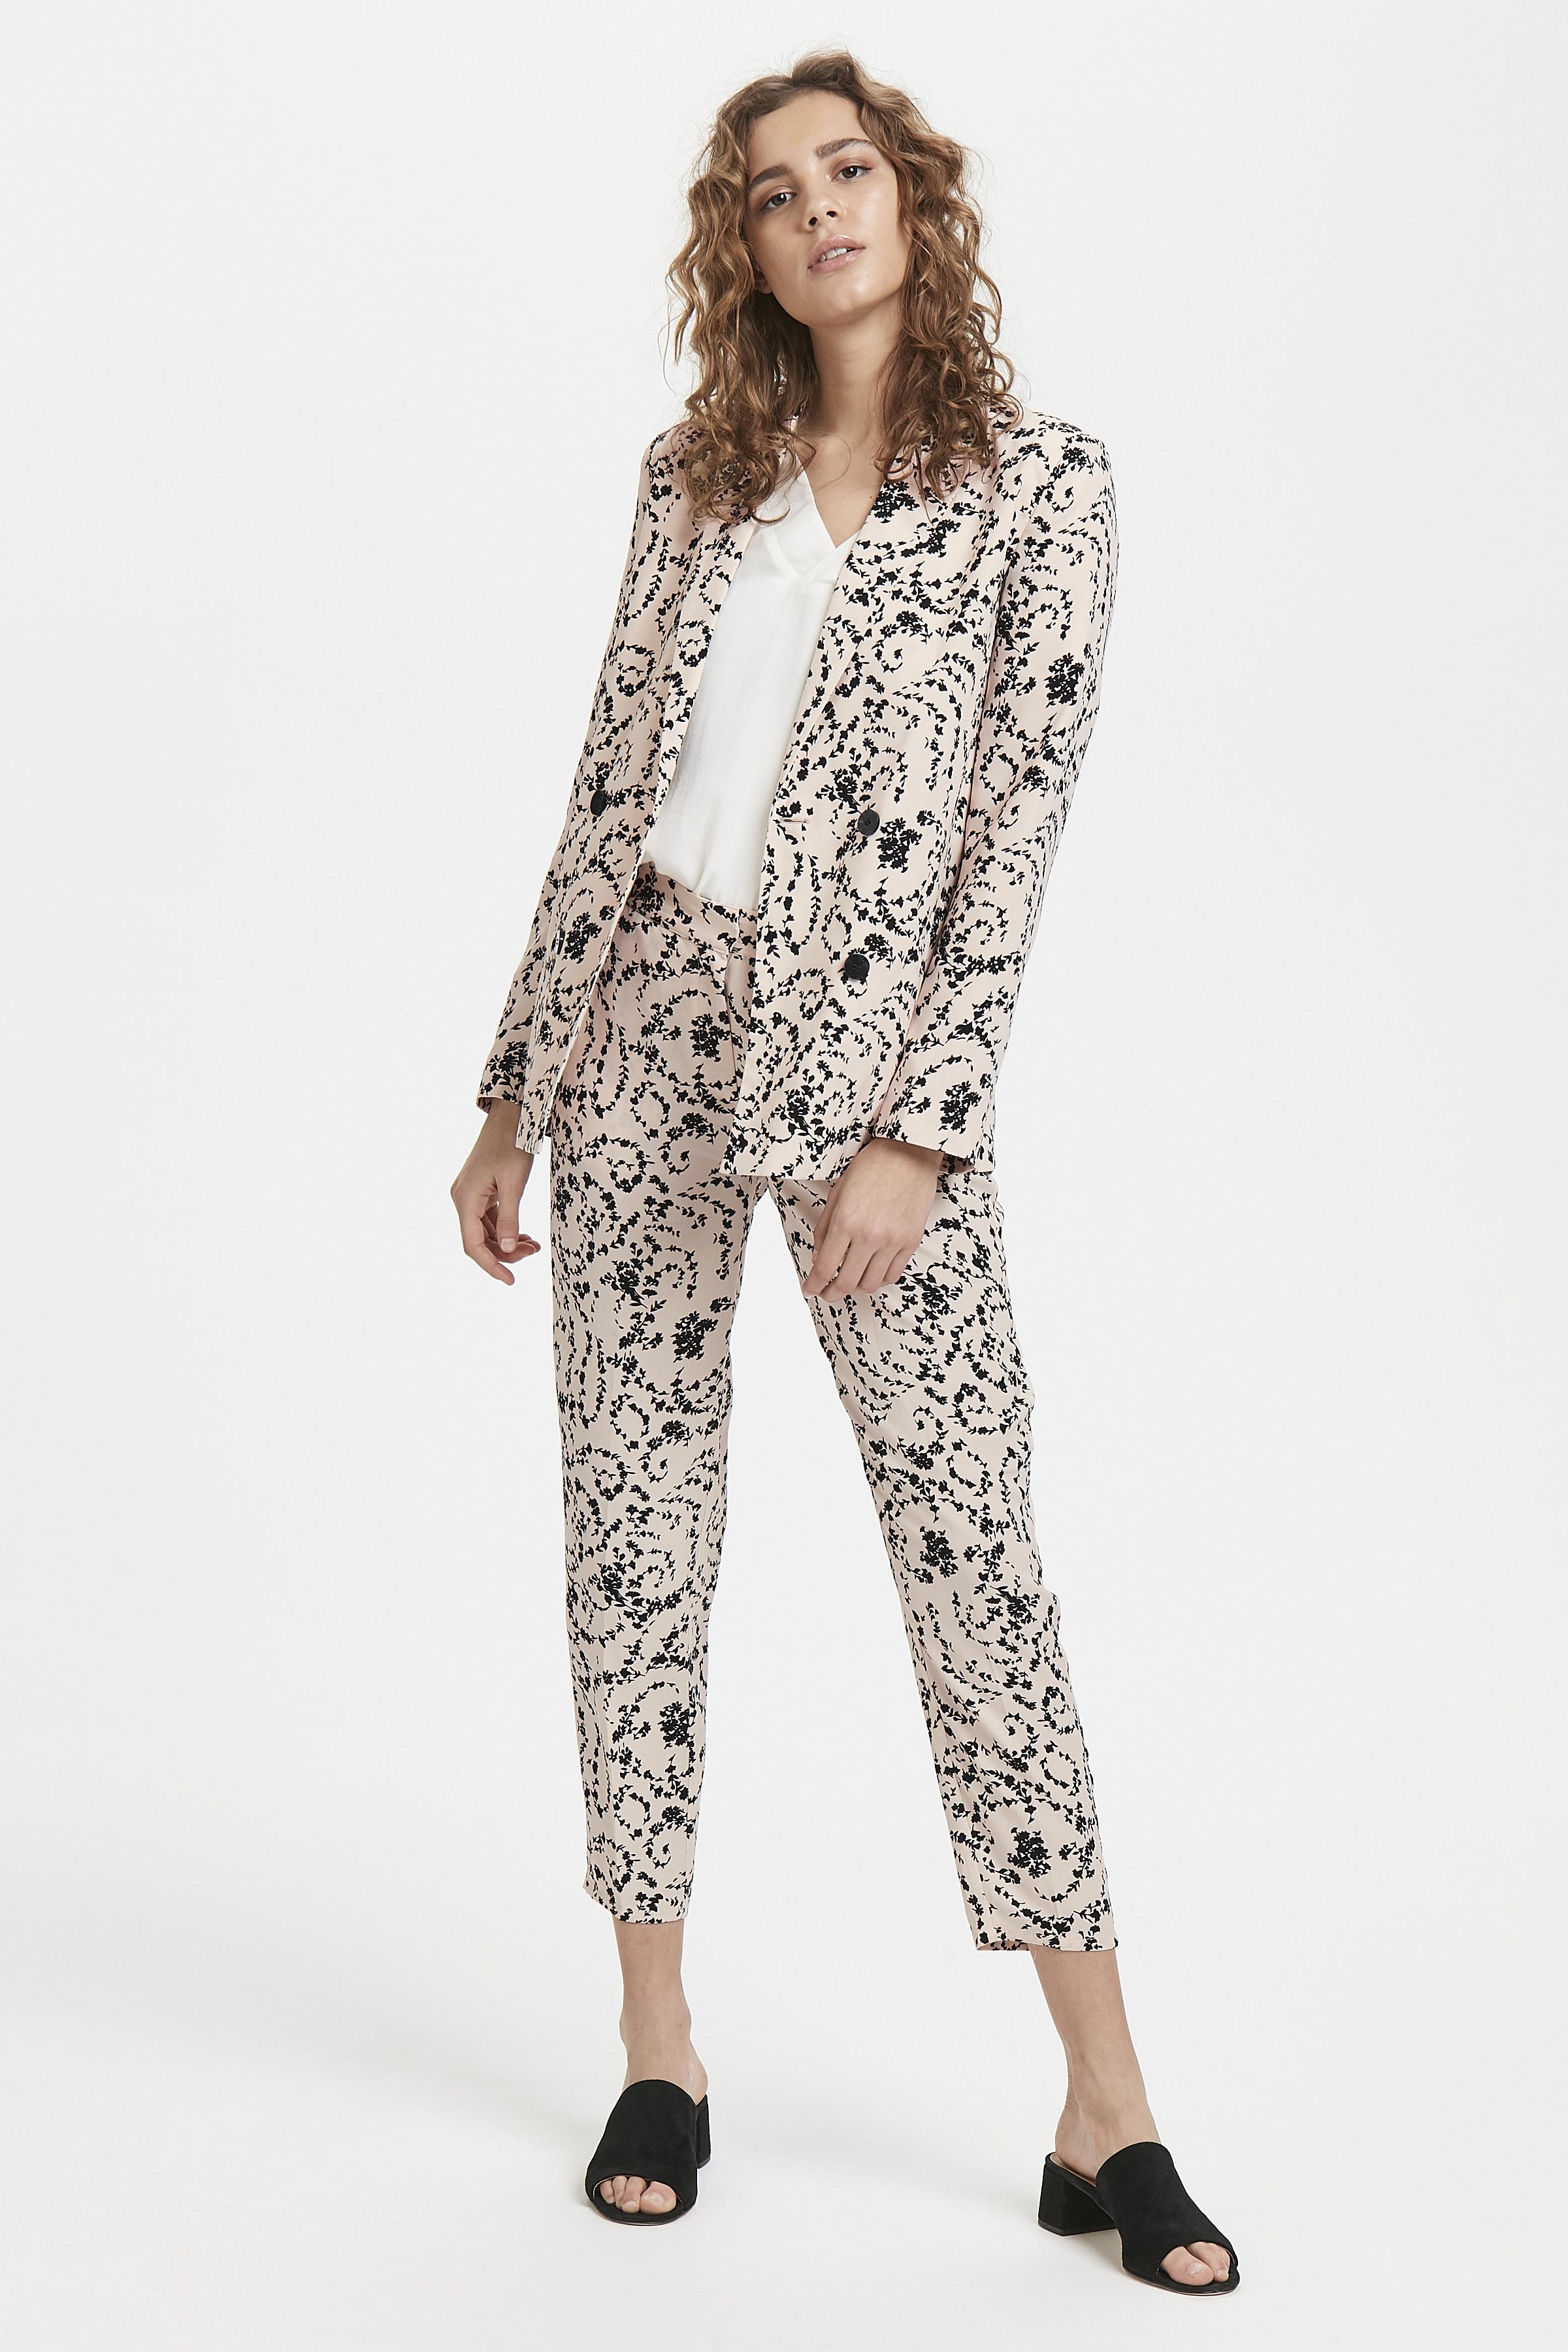 White Swan Blazer – Køb White Swan Blazer fra str. XS-XL her